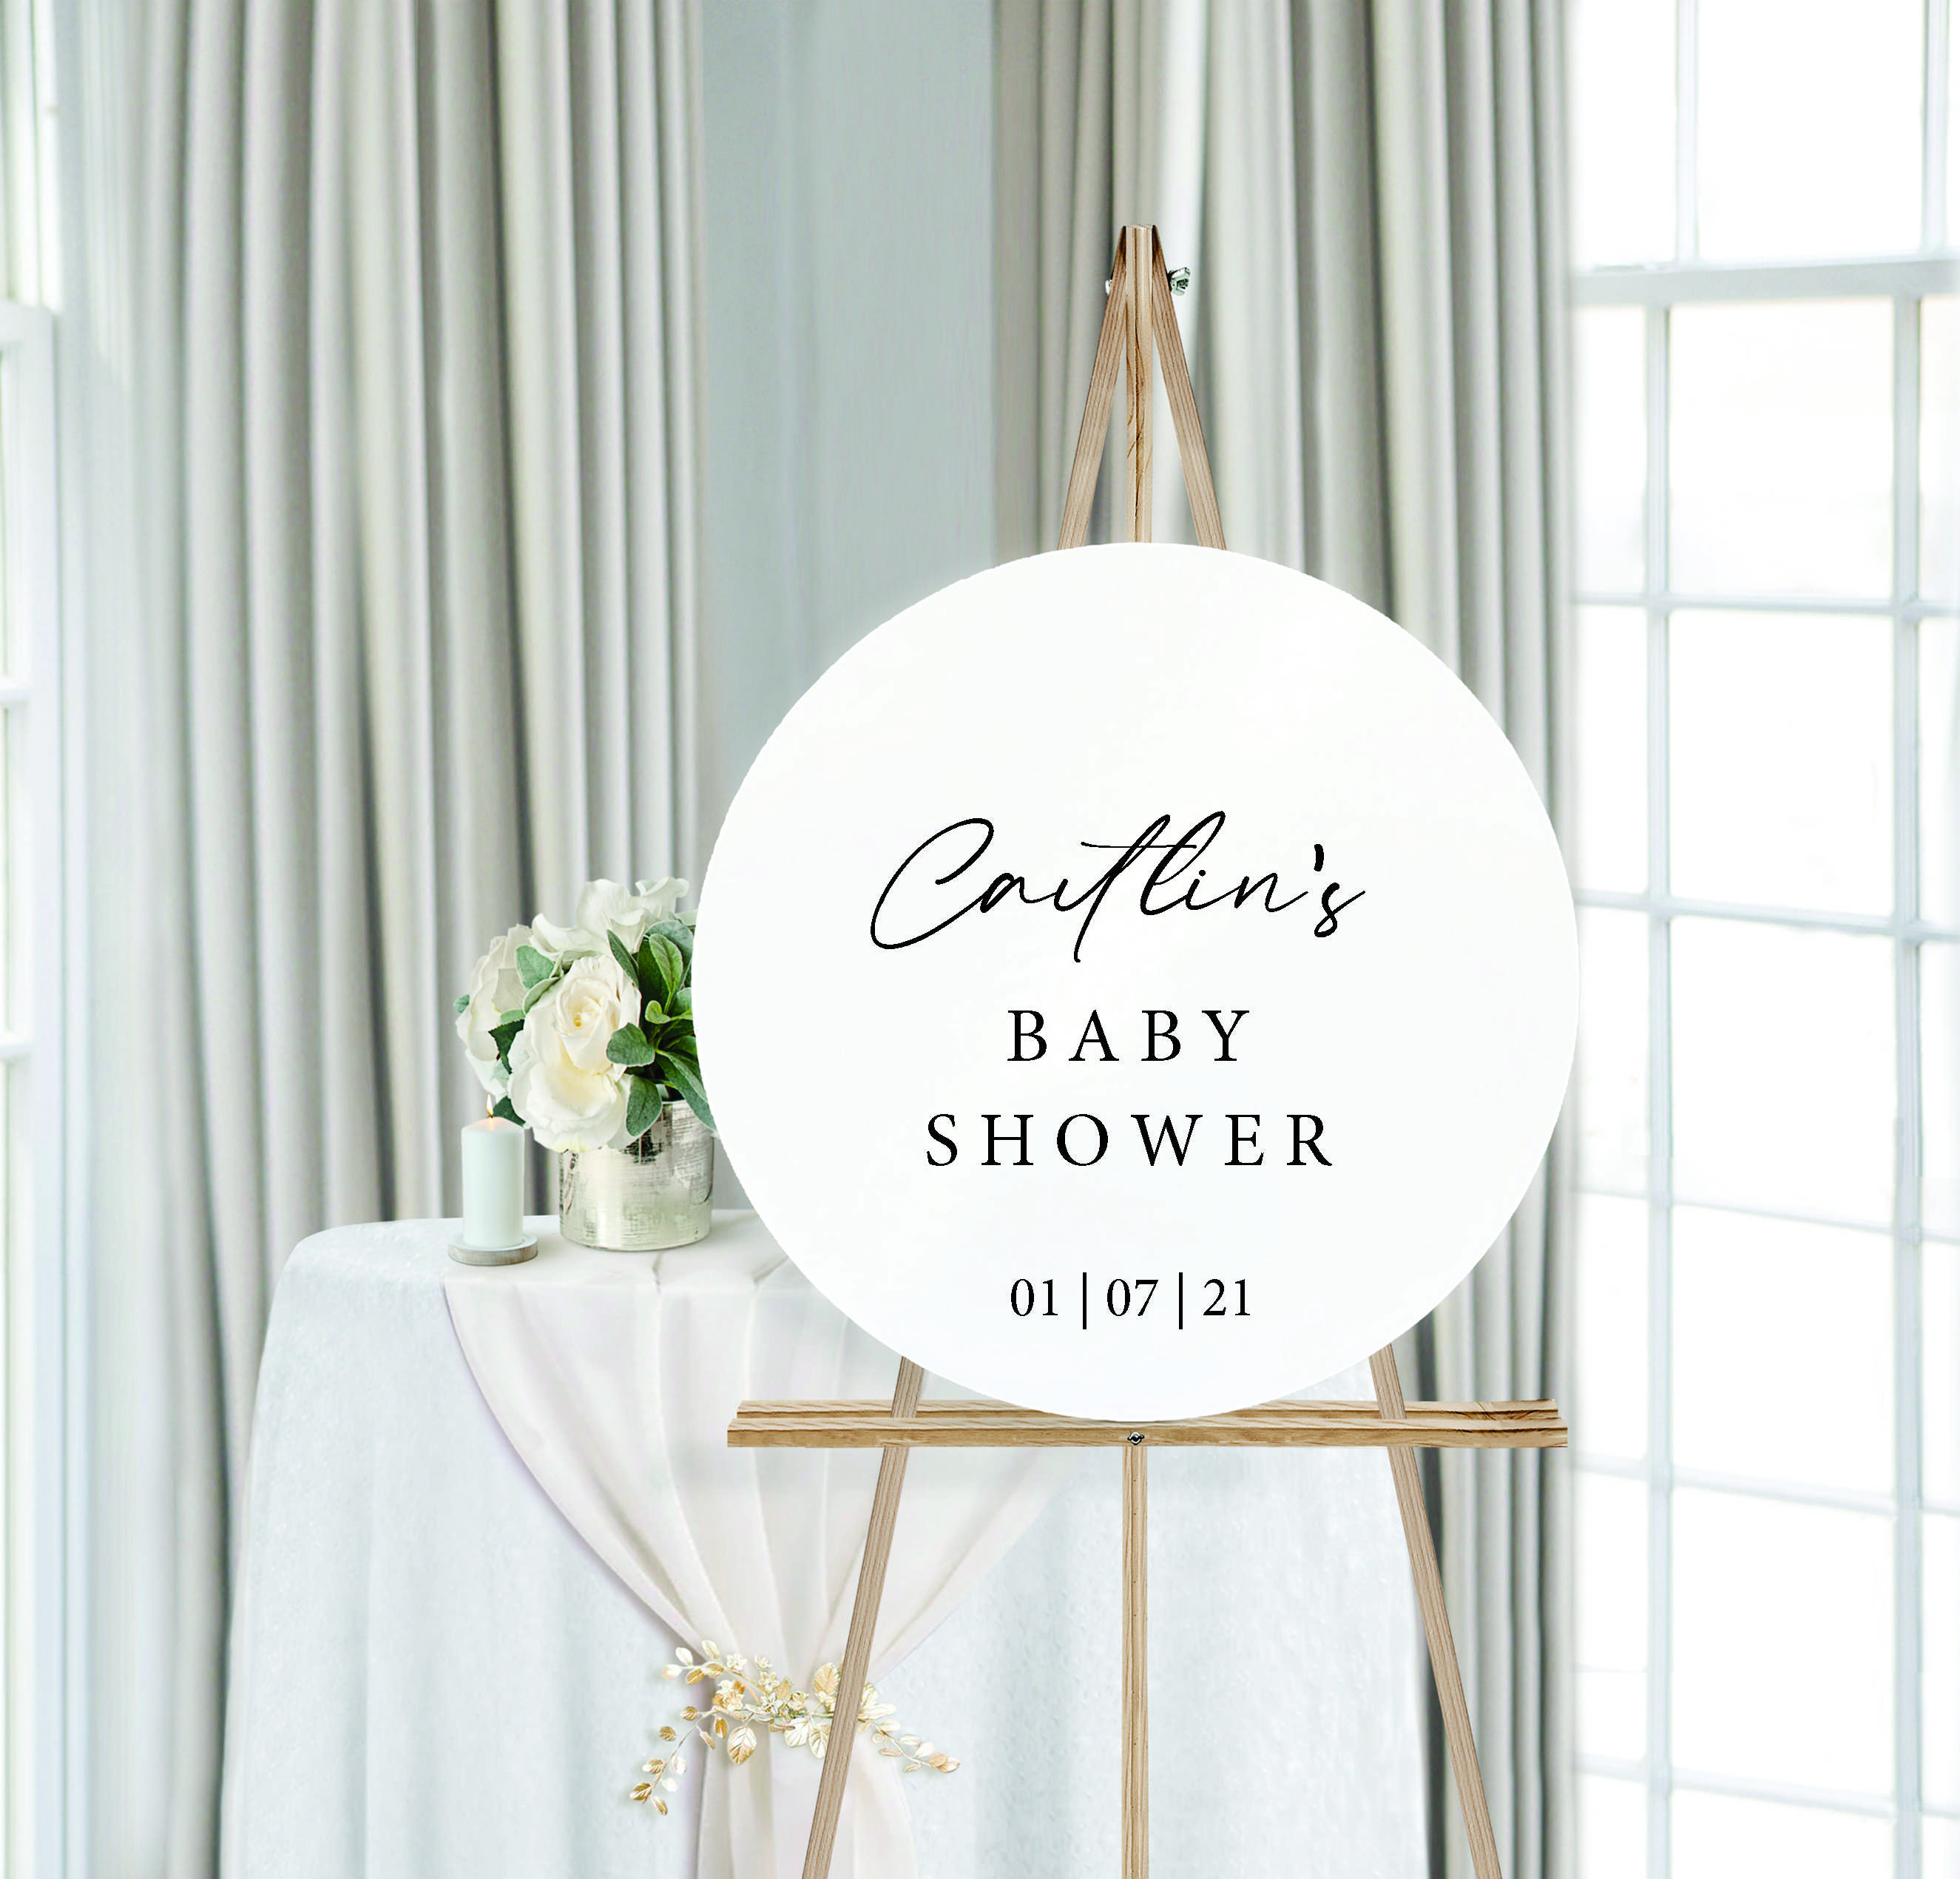 Personalised Baby Shower Round Wedding Sign